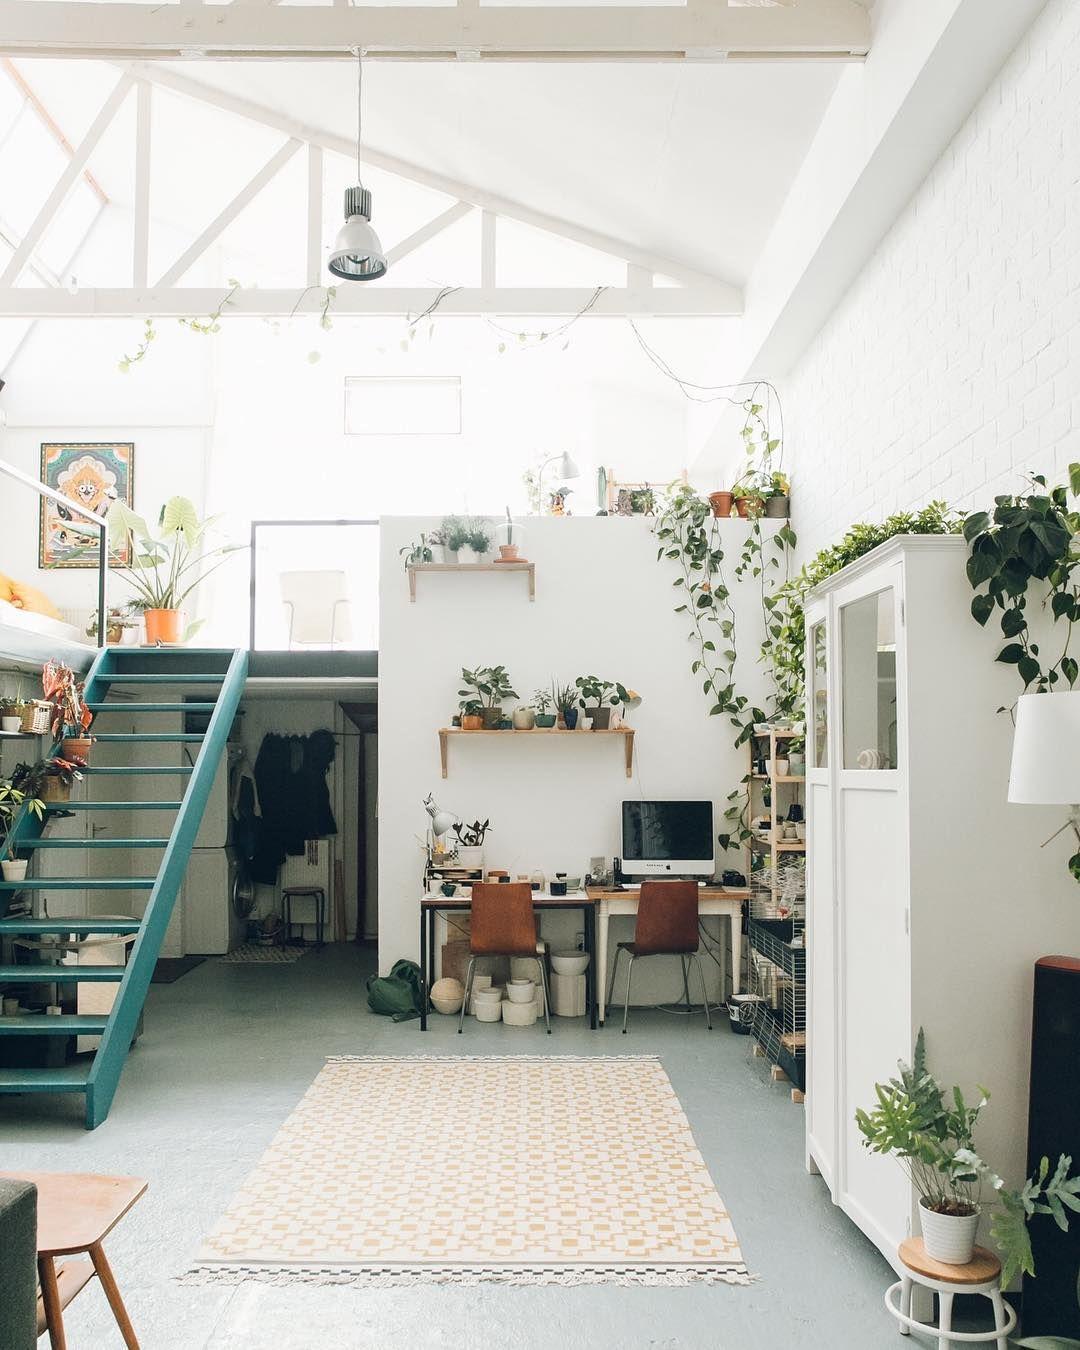 How Do You Design Home For Someone With >> Workspace Deco Pinterest Nasti House House Design Home Decor